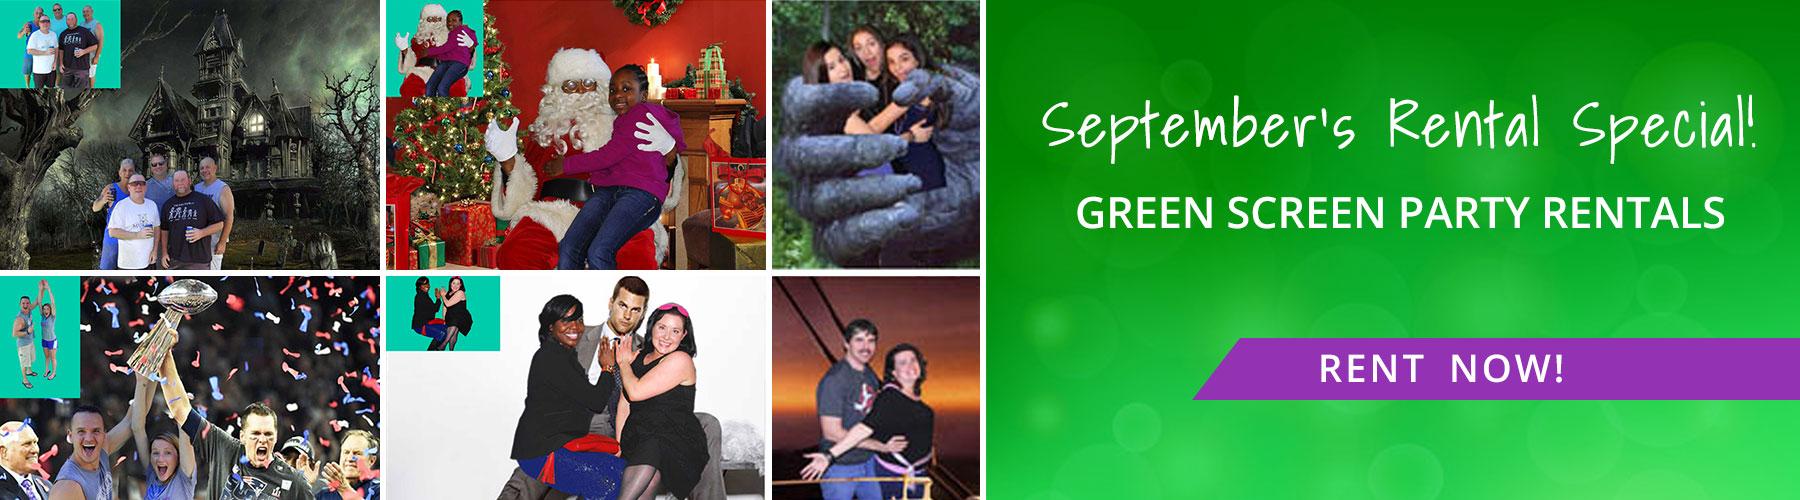 September Rental: Green Screens